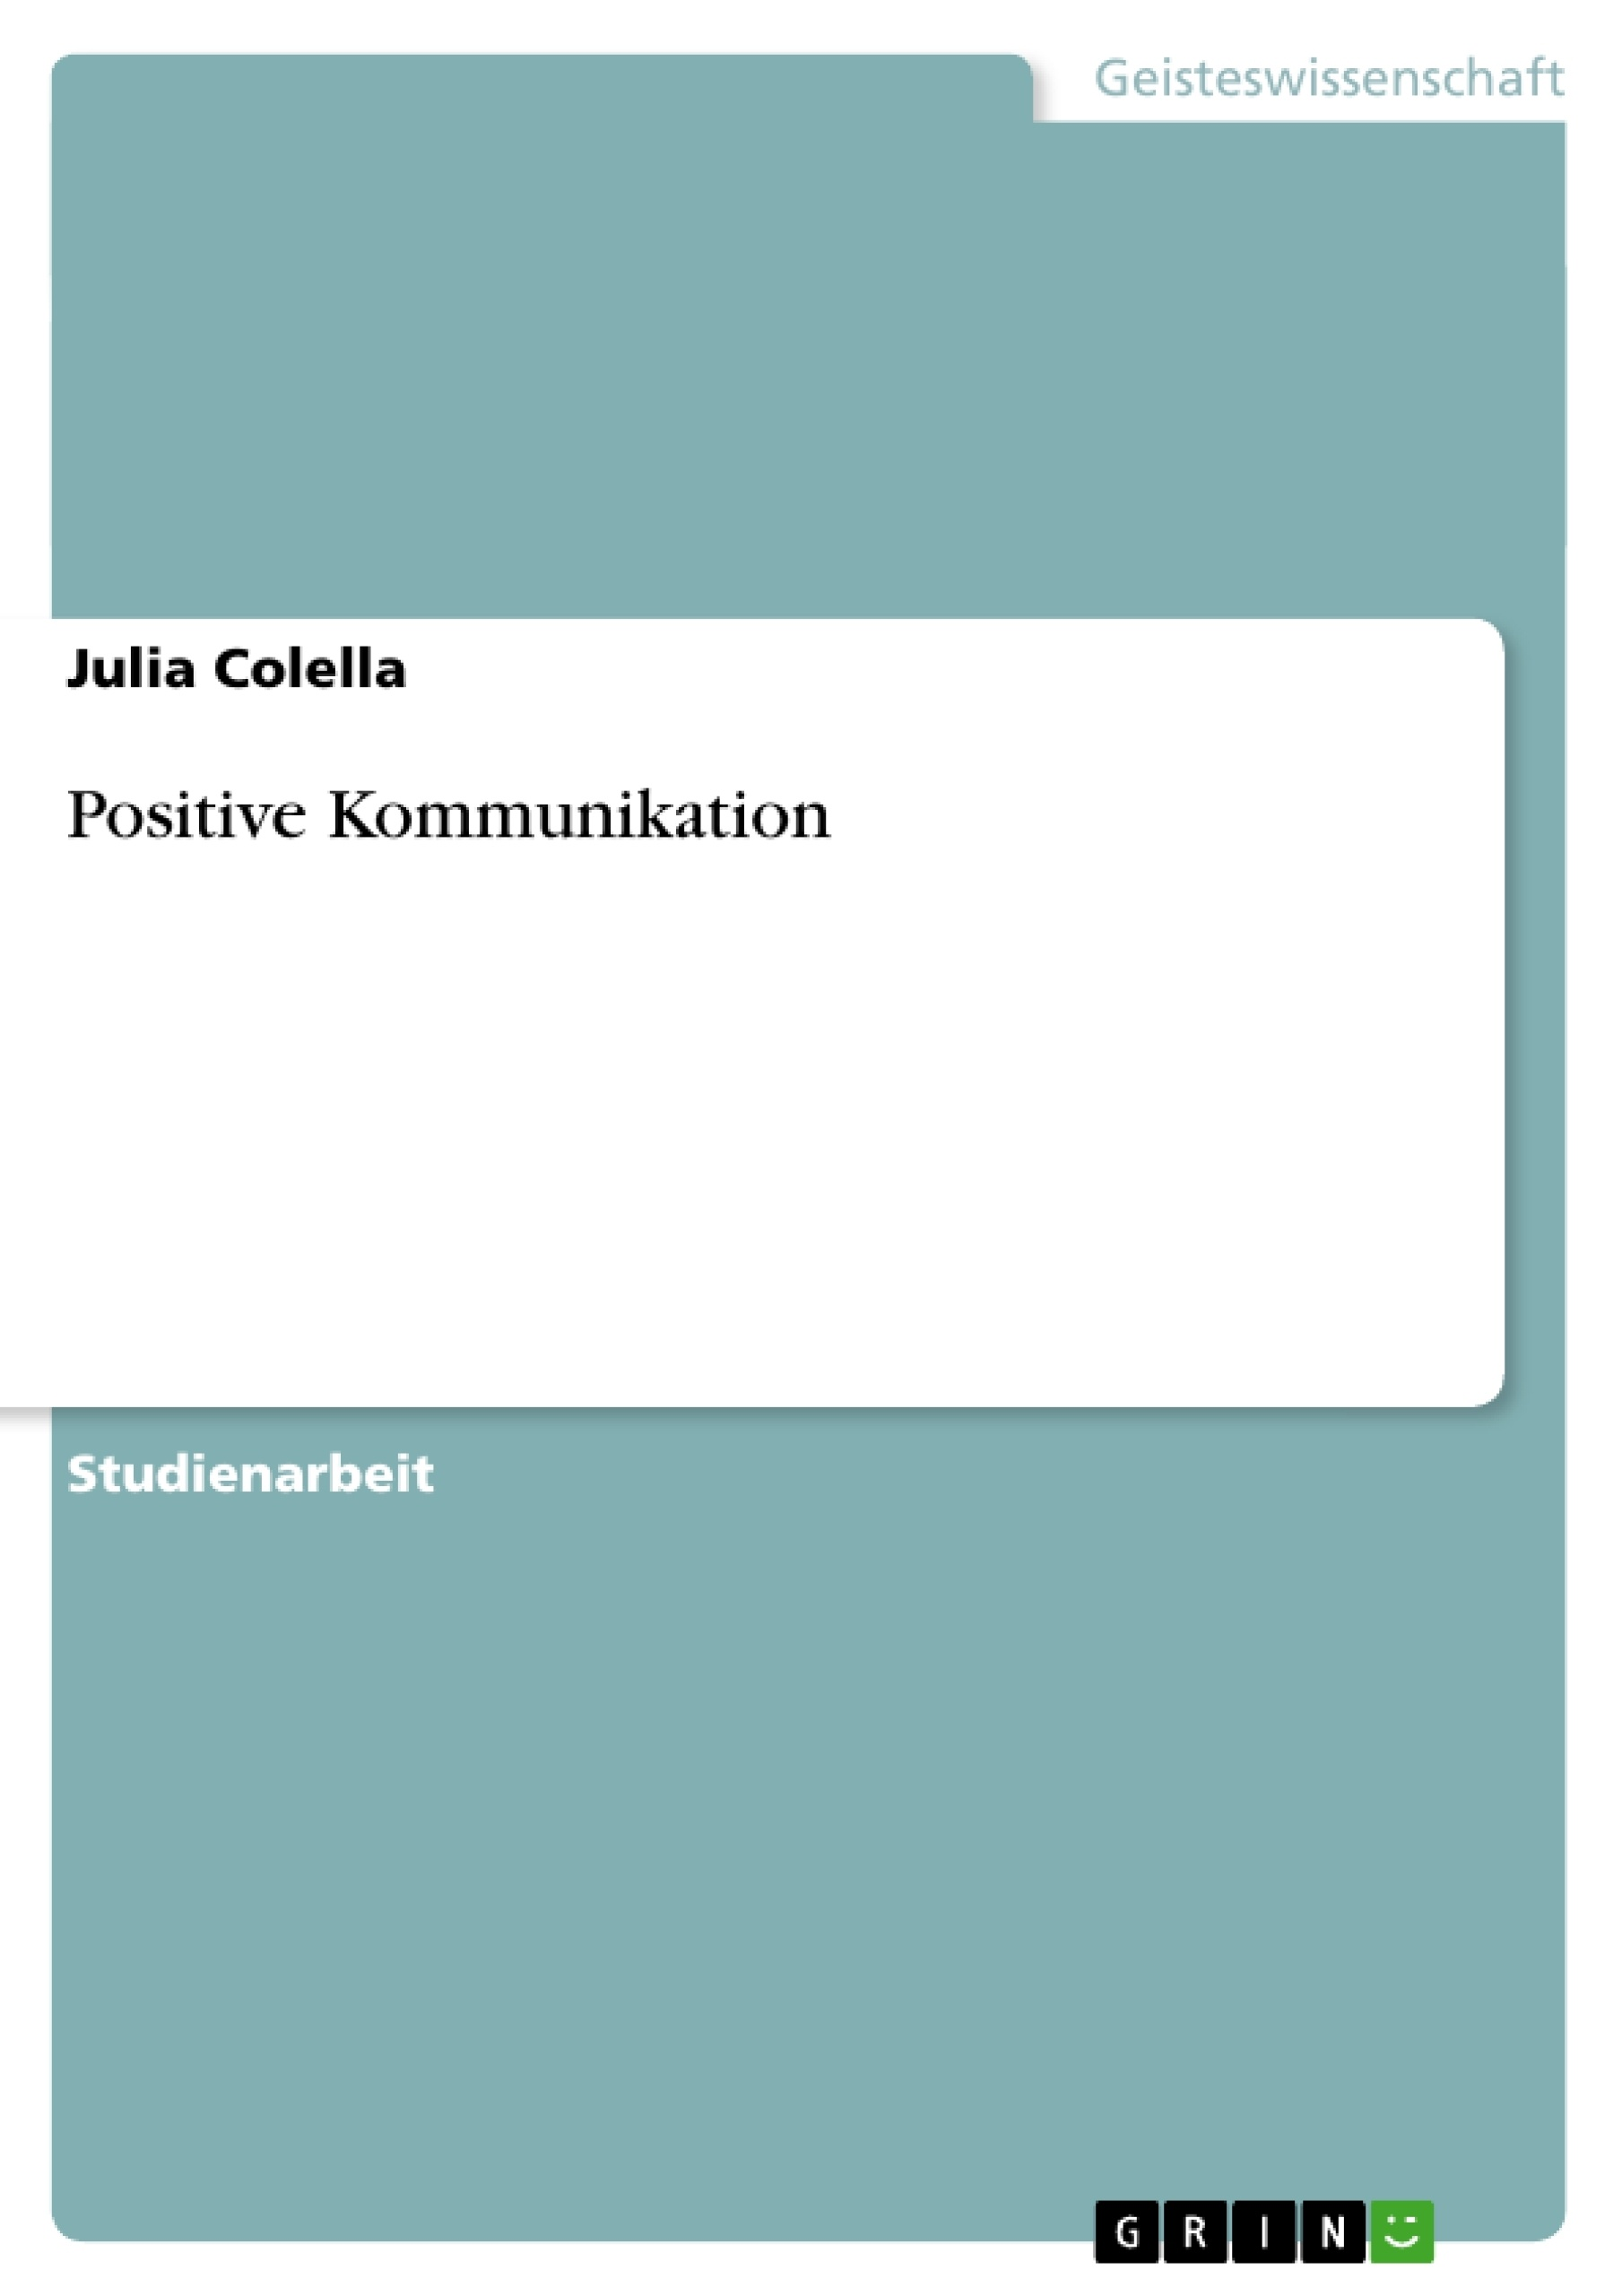 Titel: Positive Kommunikation